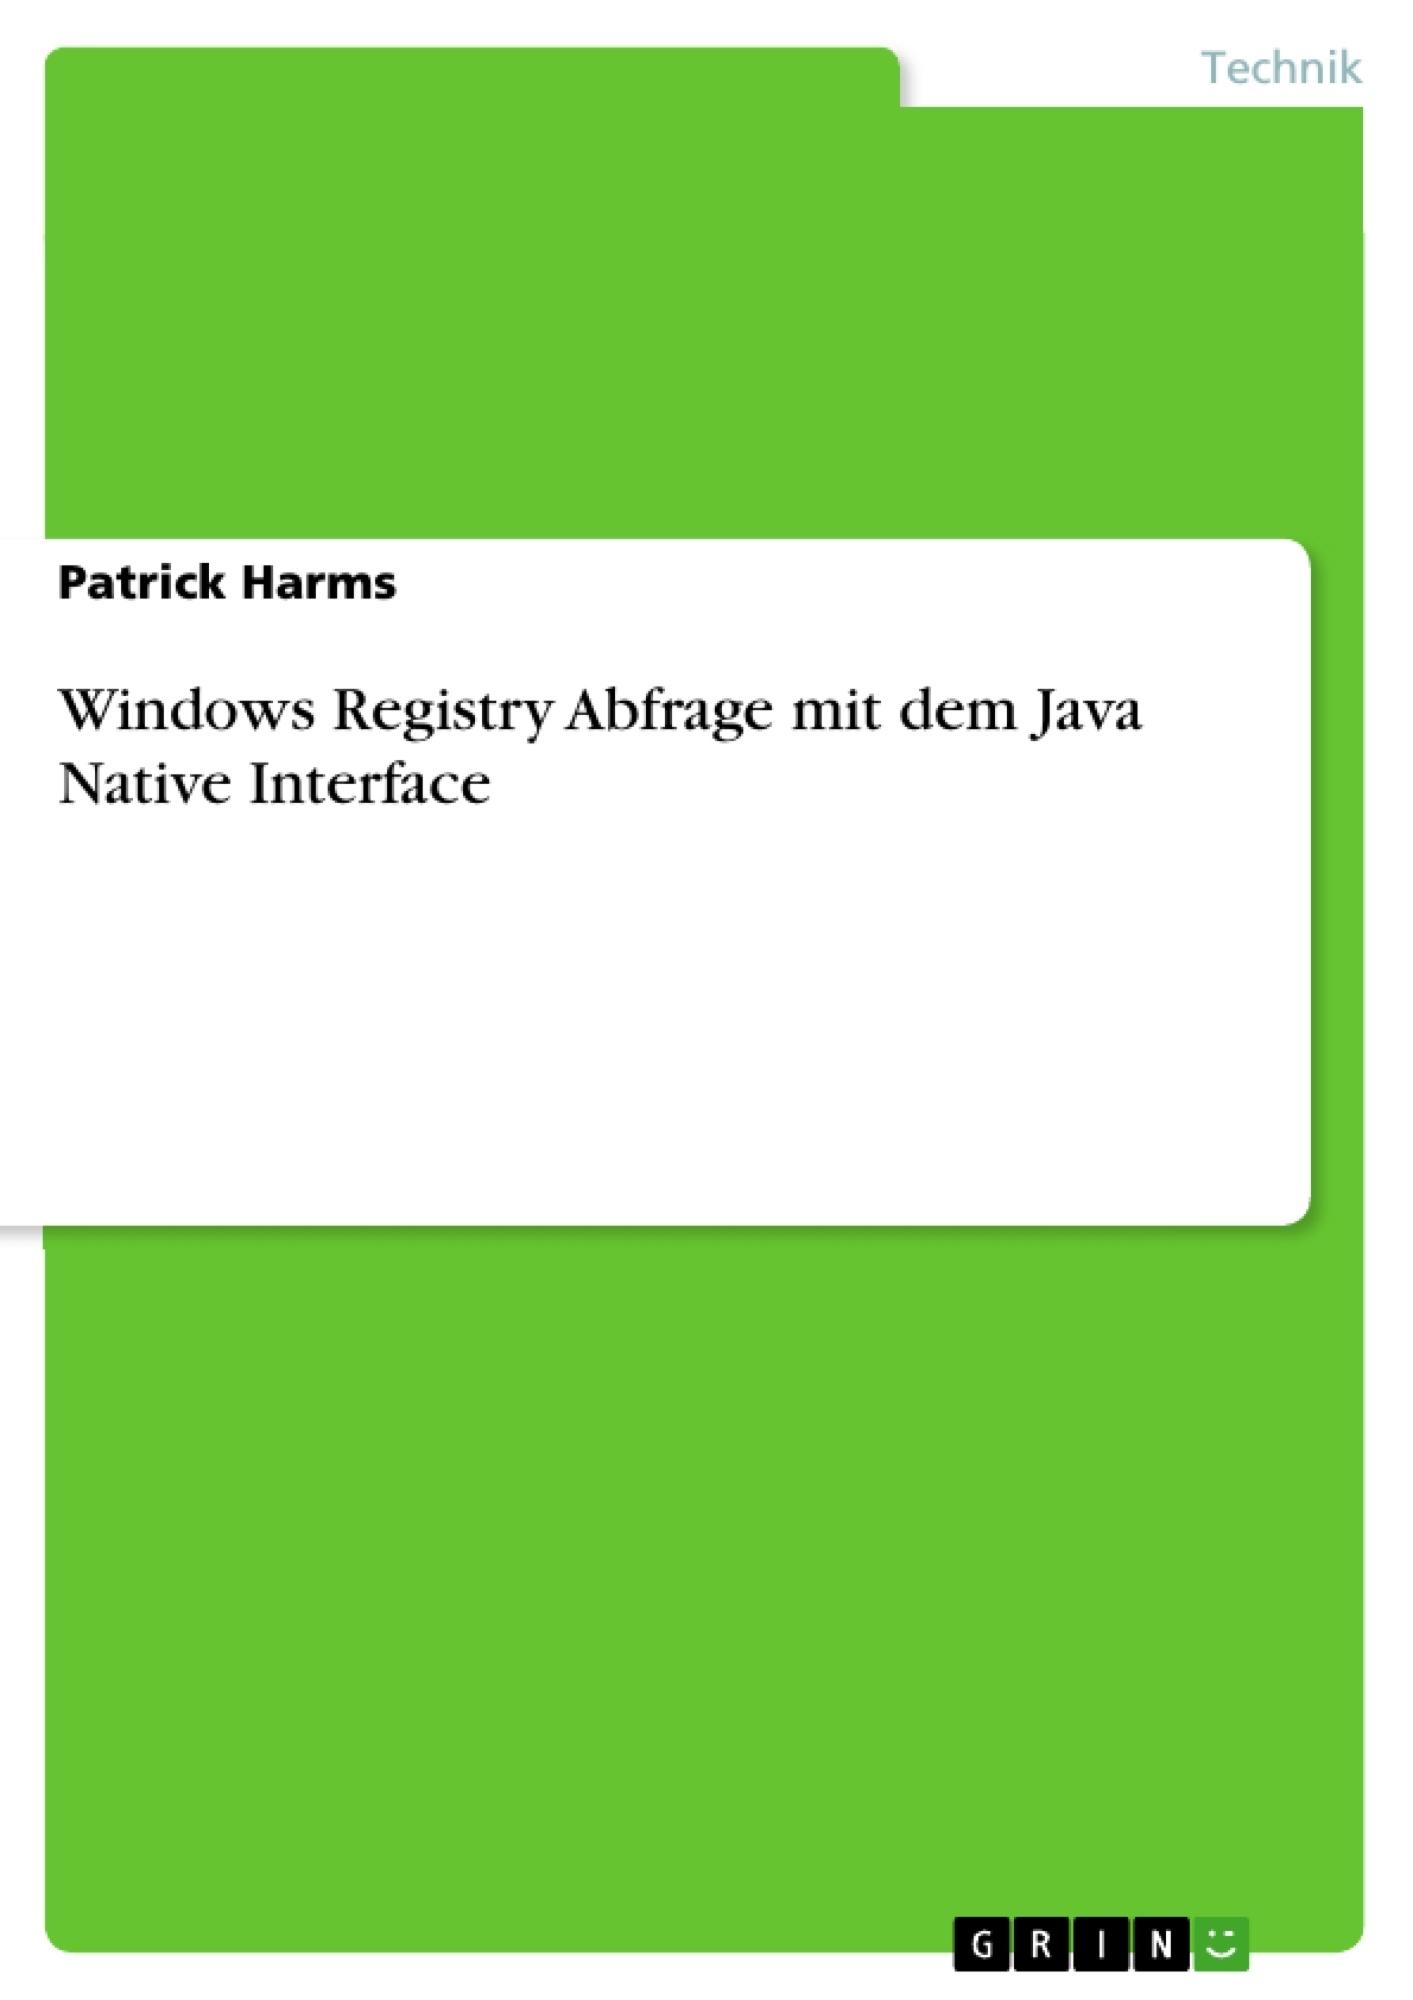 Titel: Windows Registry Abfrage mit dem Java Native Interface